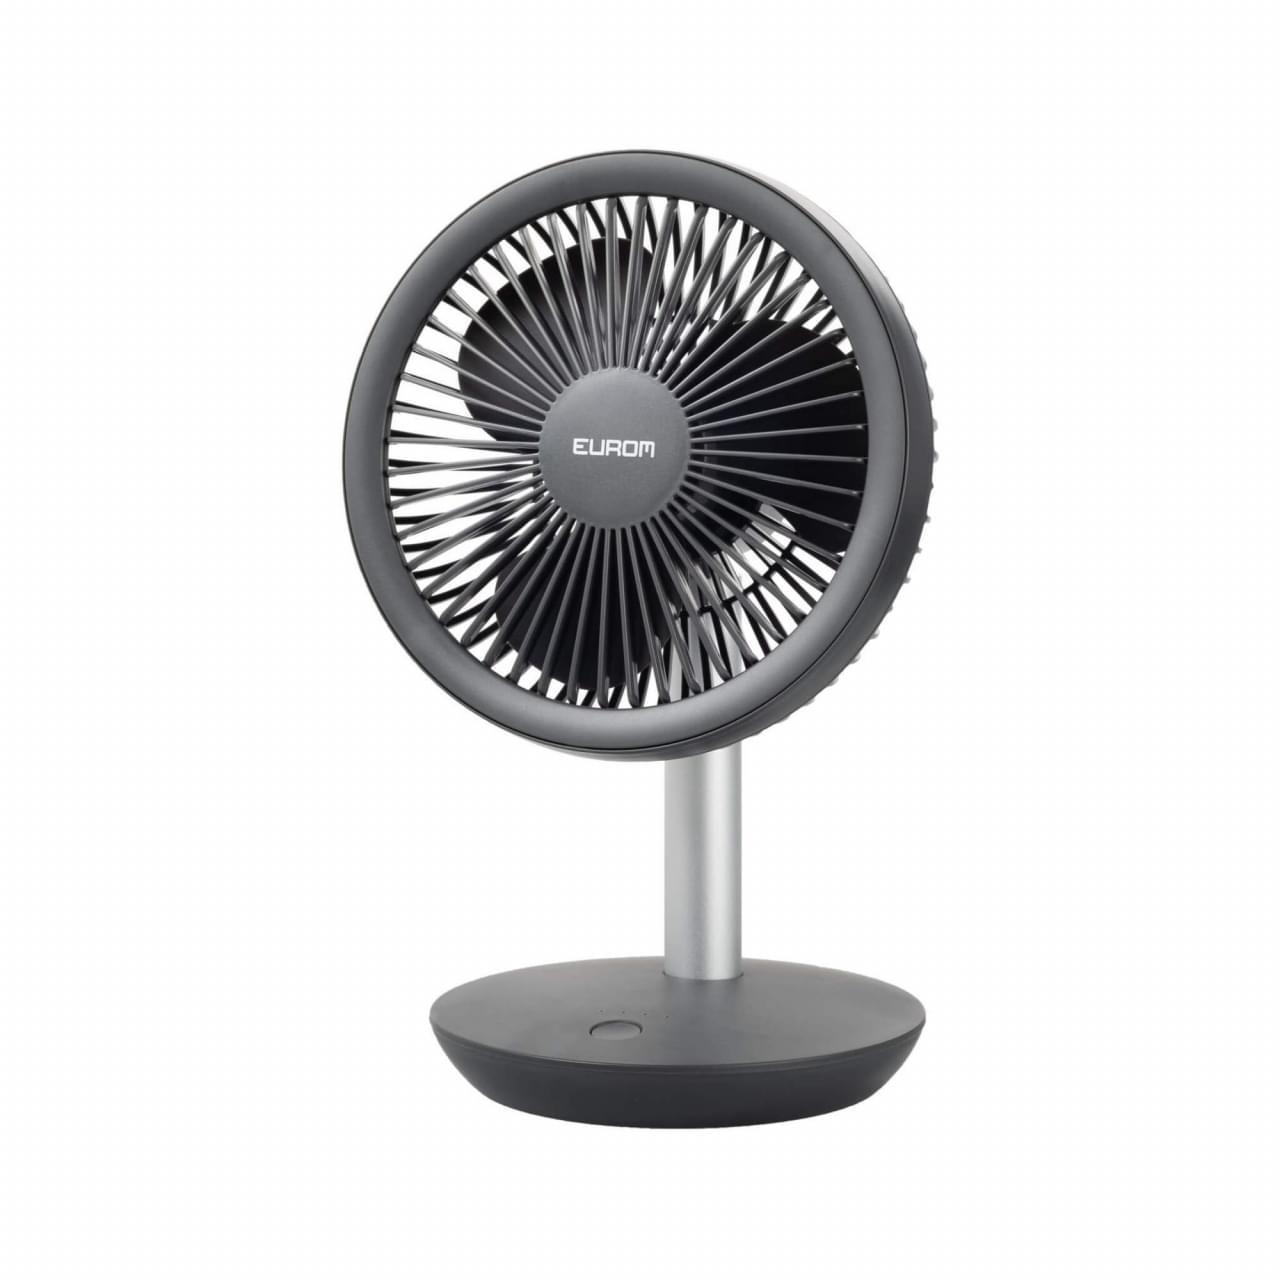 Eurom Vento Bureau Ventilator